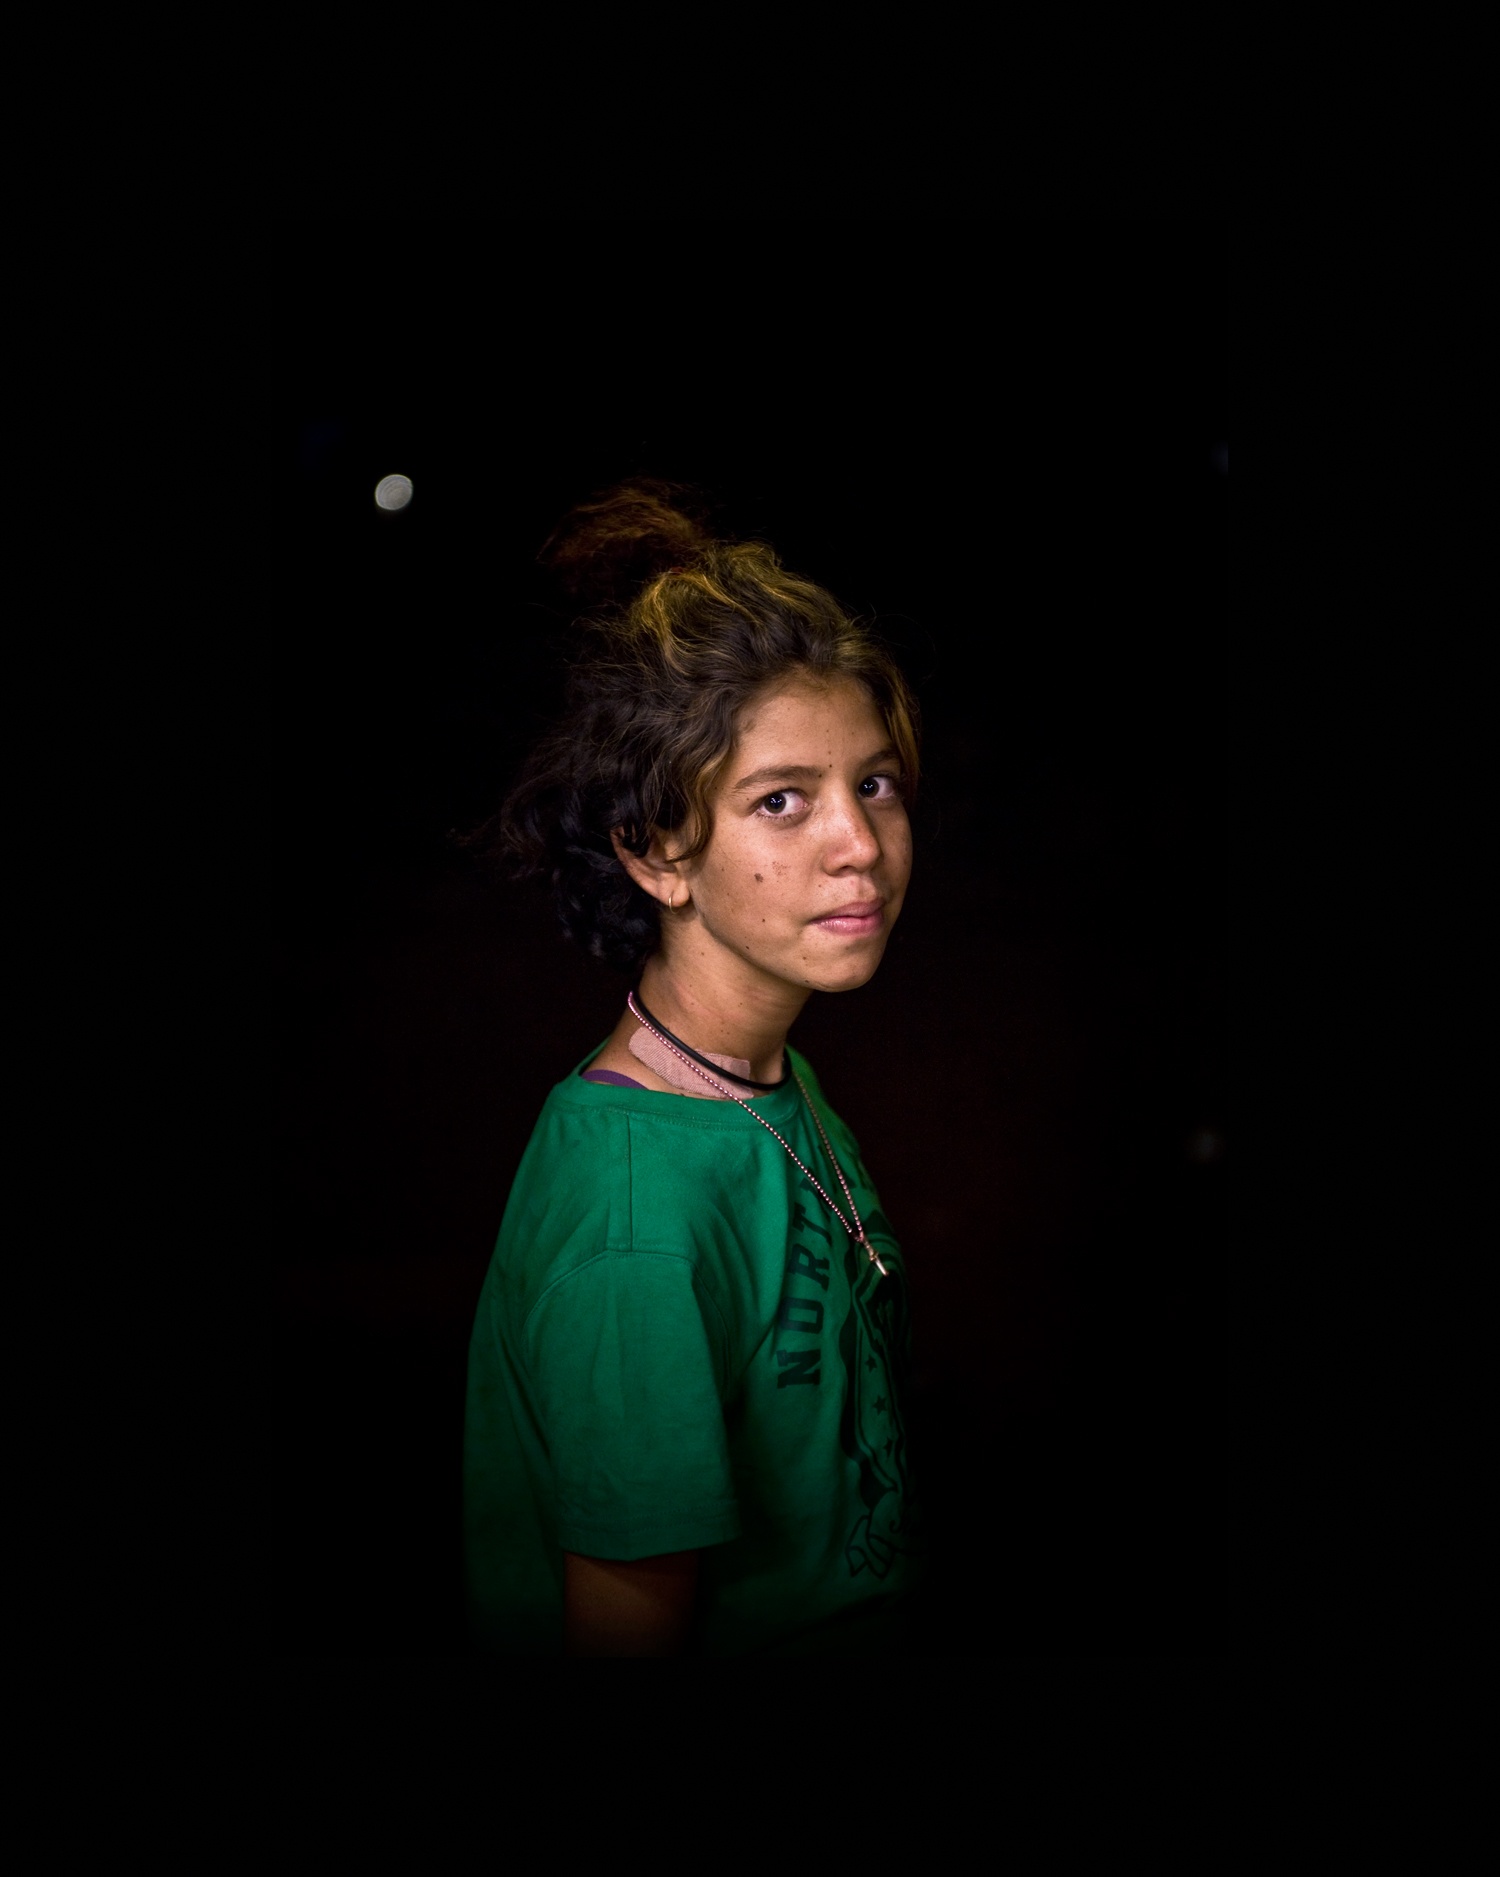 'Nyirripi Girl With Green T-shirt'